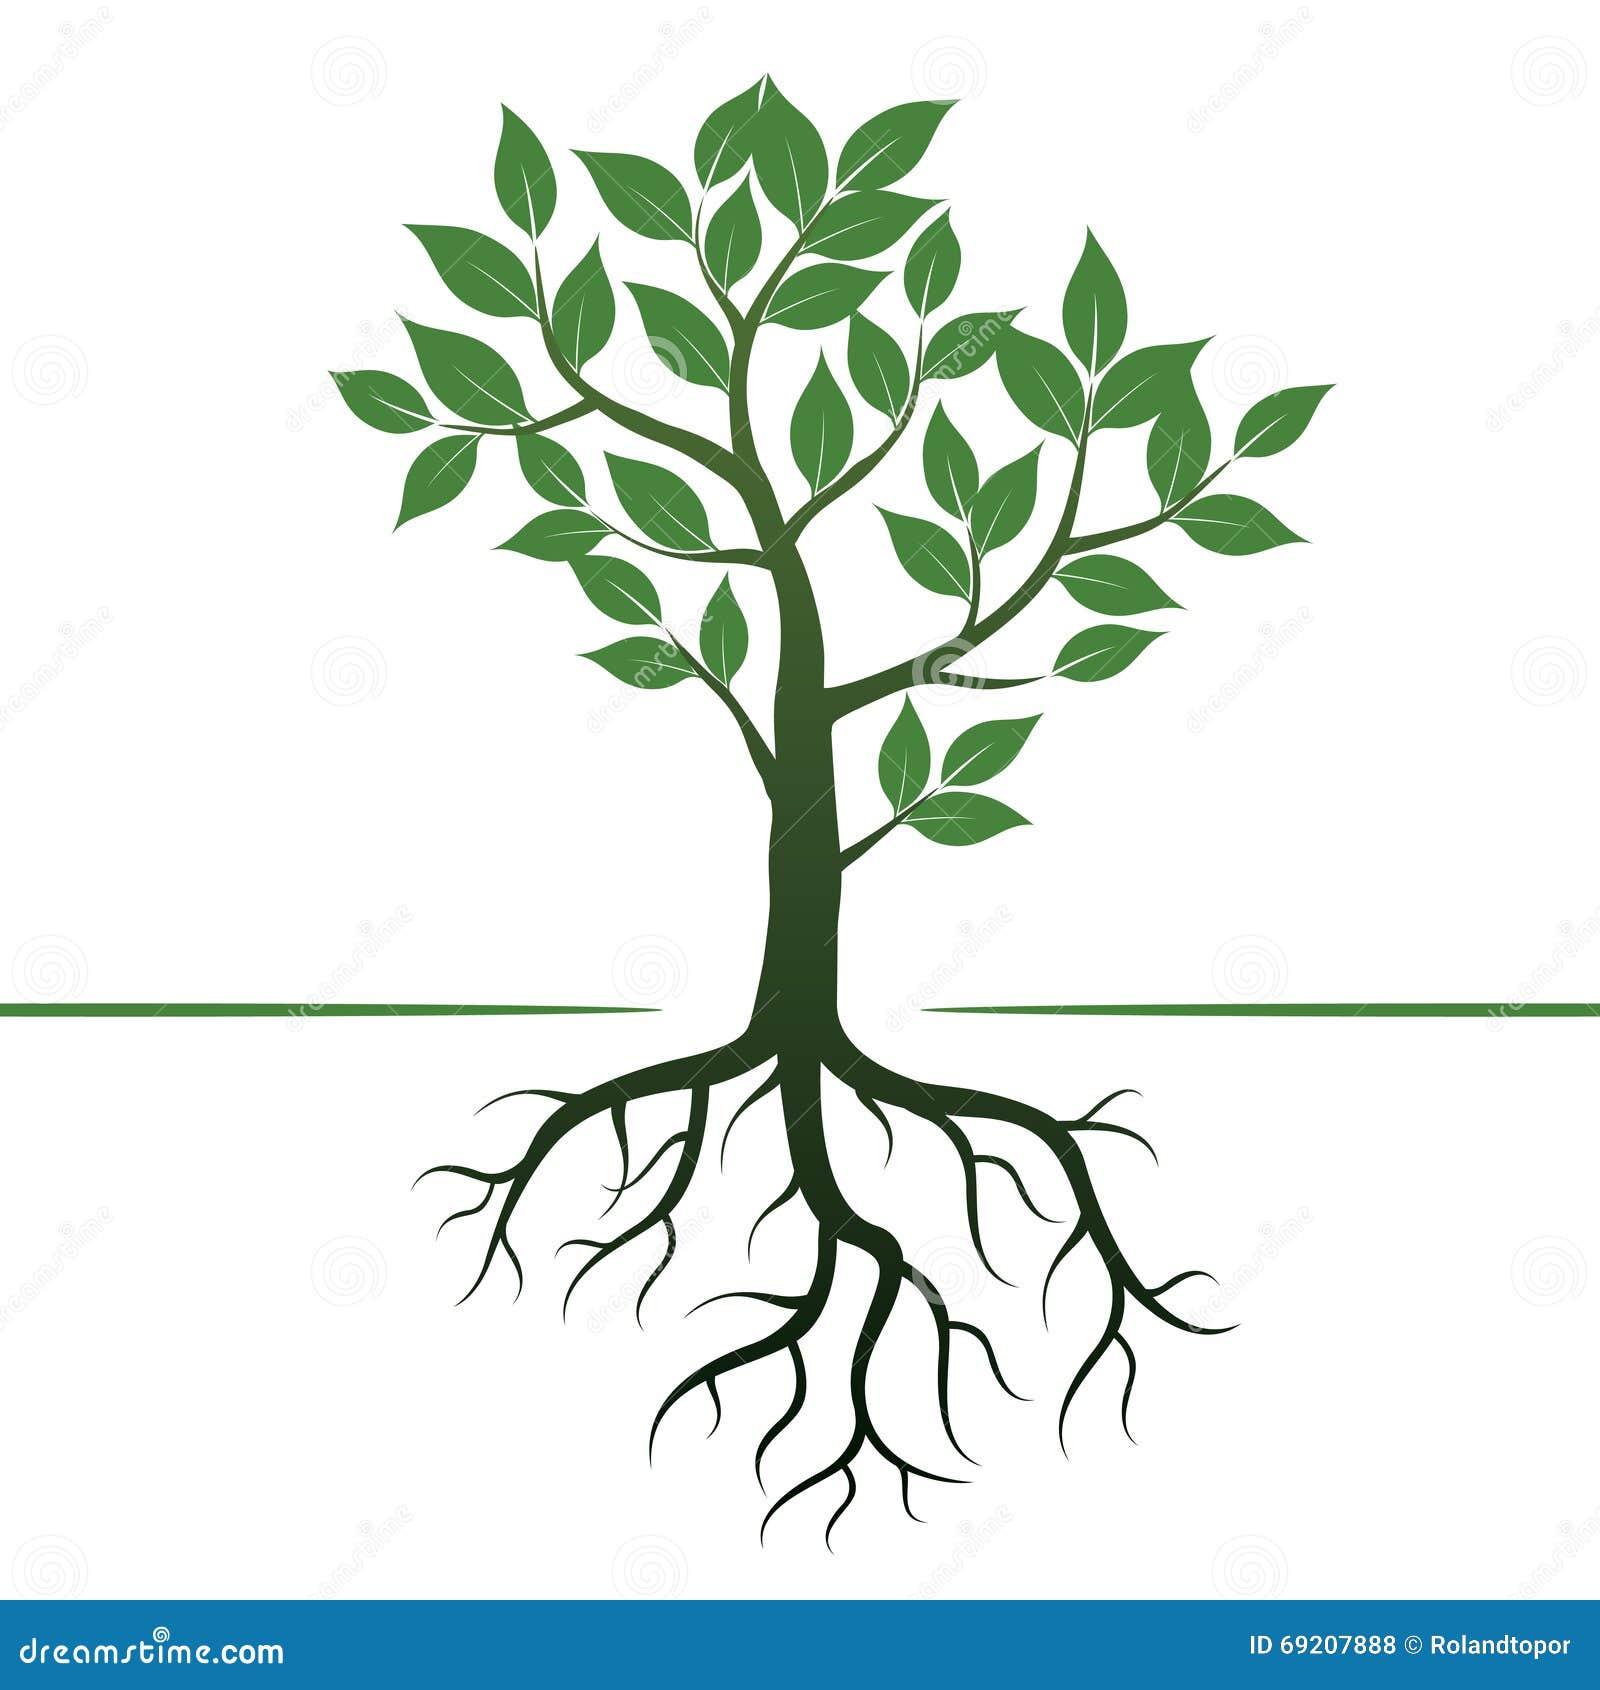 Vector Illustration Tree: Green Tree And Roots. Vector Illustration. Stock